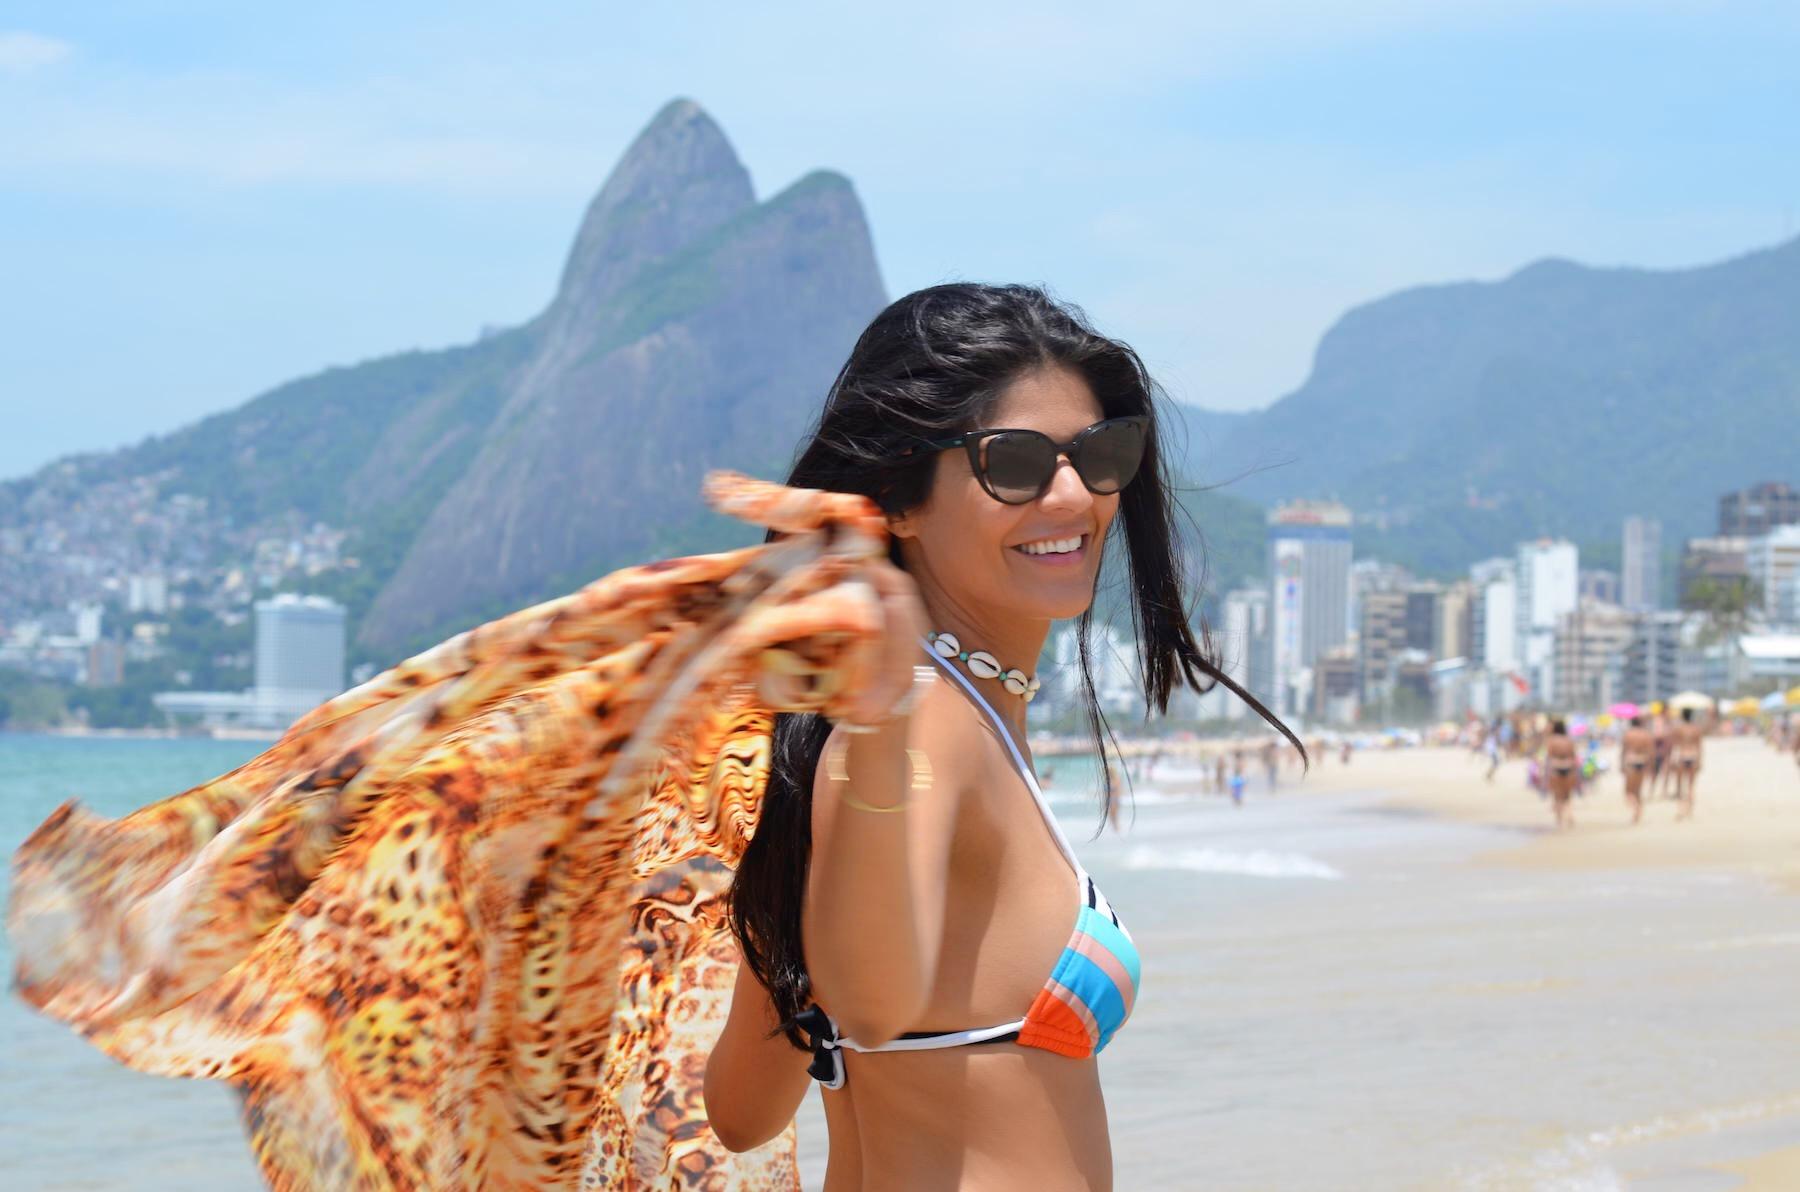 praia-de-ipanema-beta-pinheiro-3